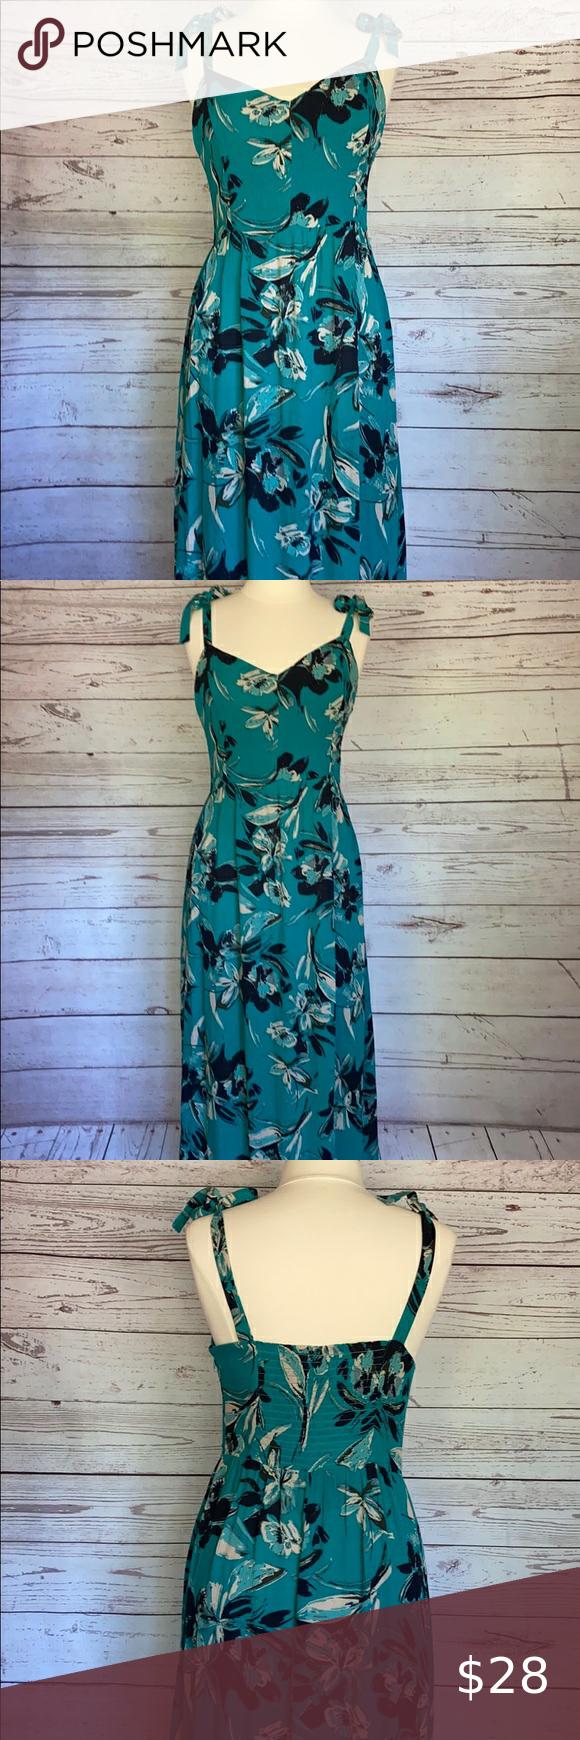 Nwt Tahari Teal Floral Print Maxi Dress Printed Maxi Dress Floral Print Maxi Dress Floral Print Maxi [ 1740 x 580 Pixel ]